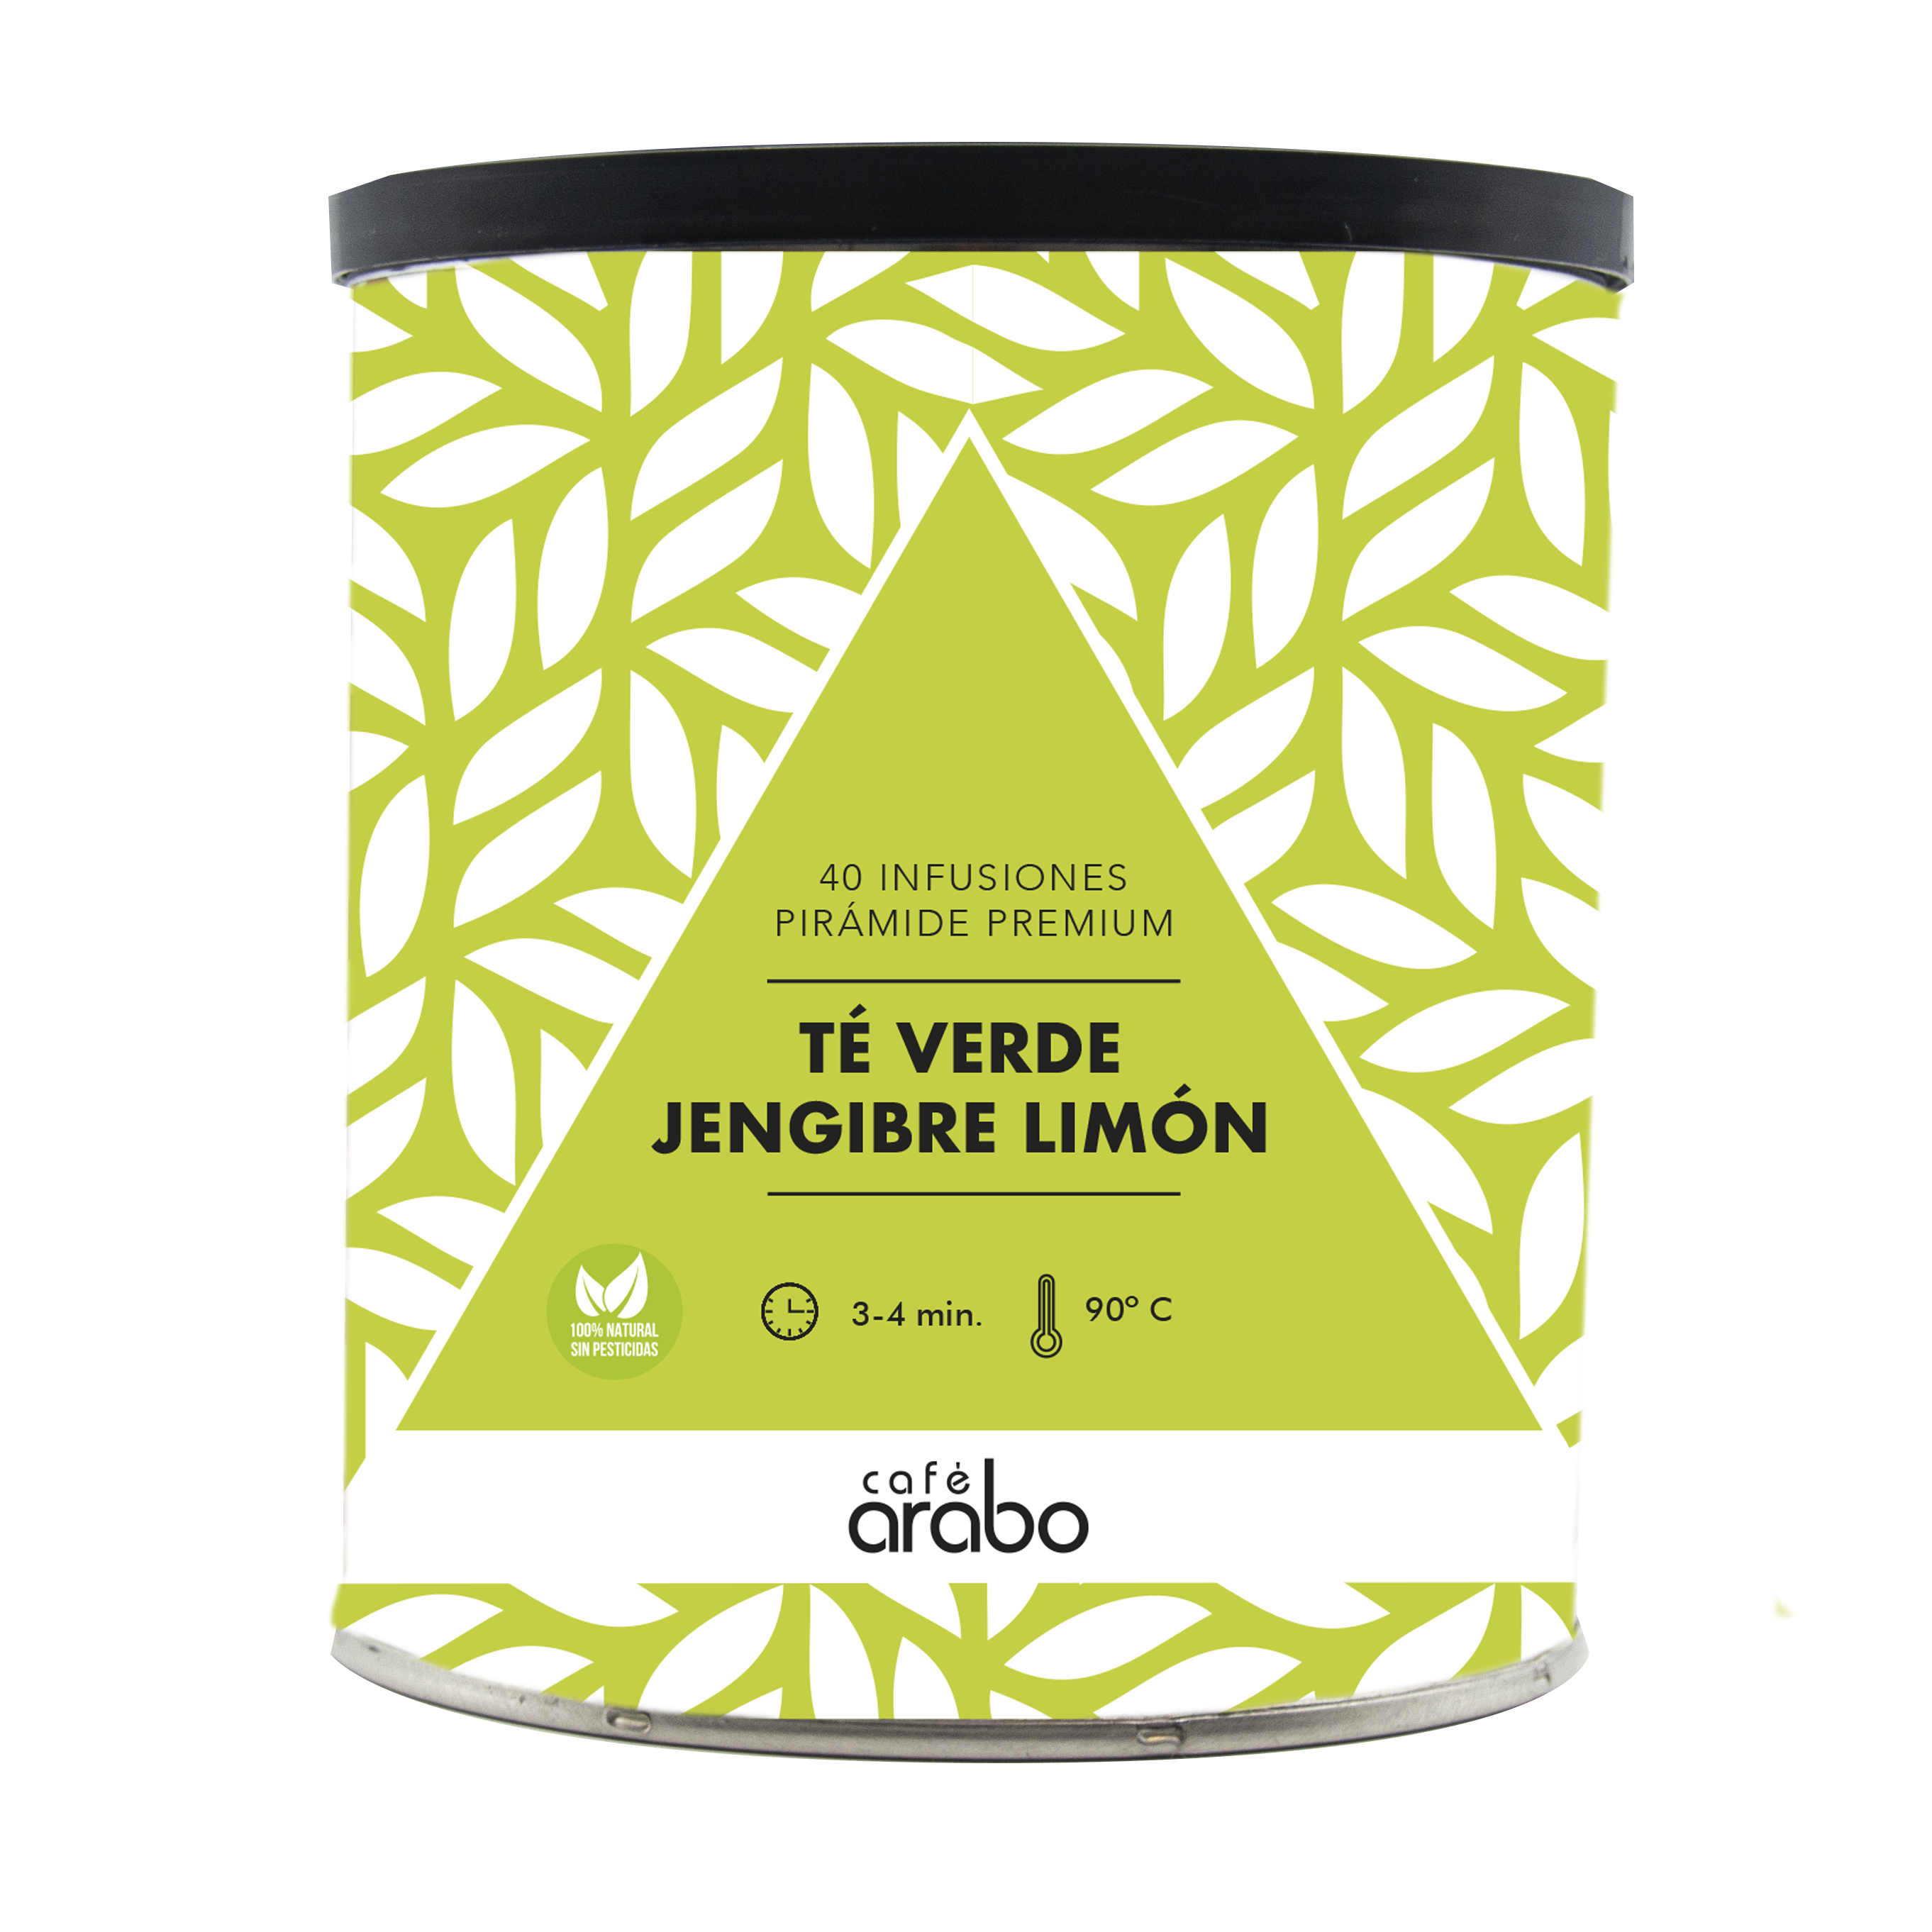 lata-alta-piramides-jengibre-limon